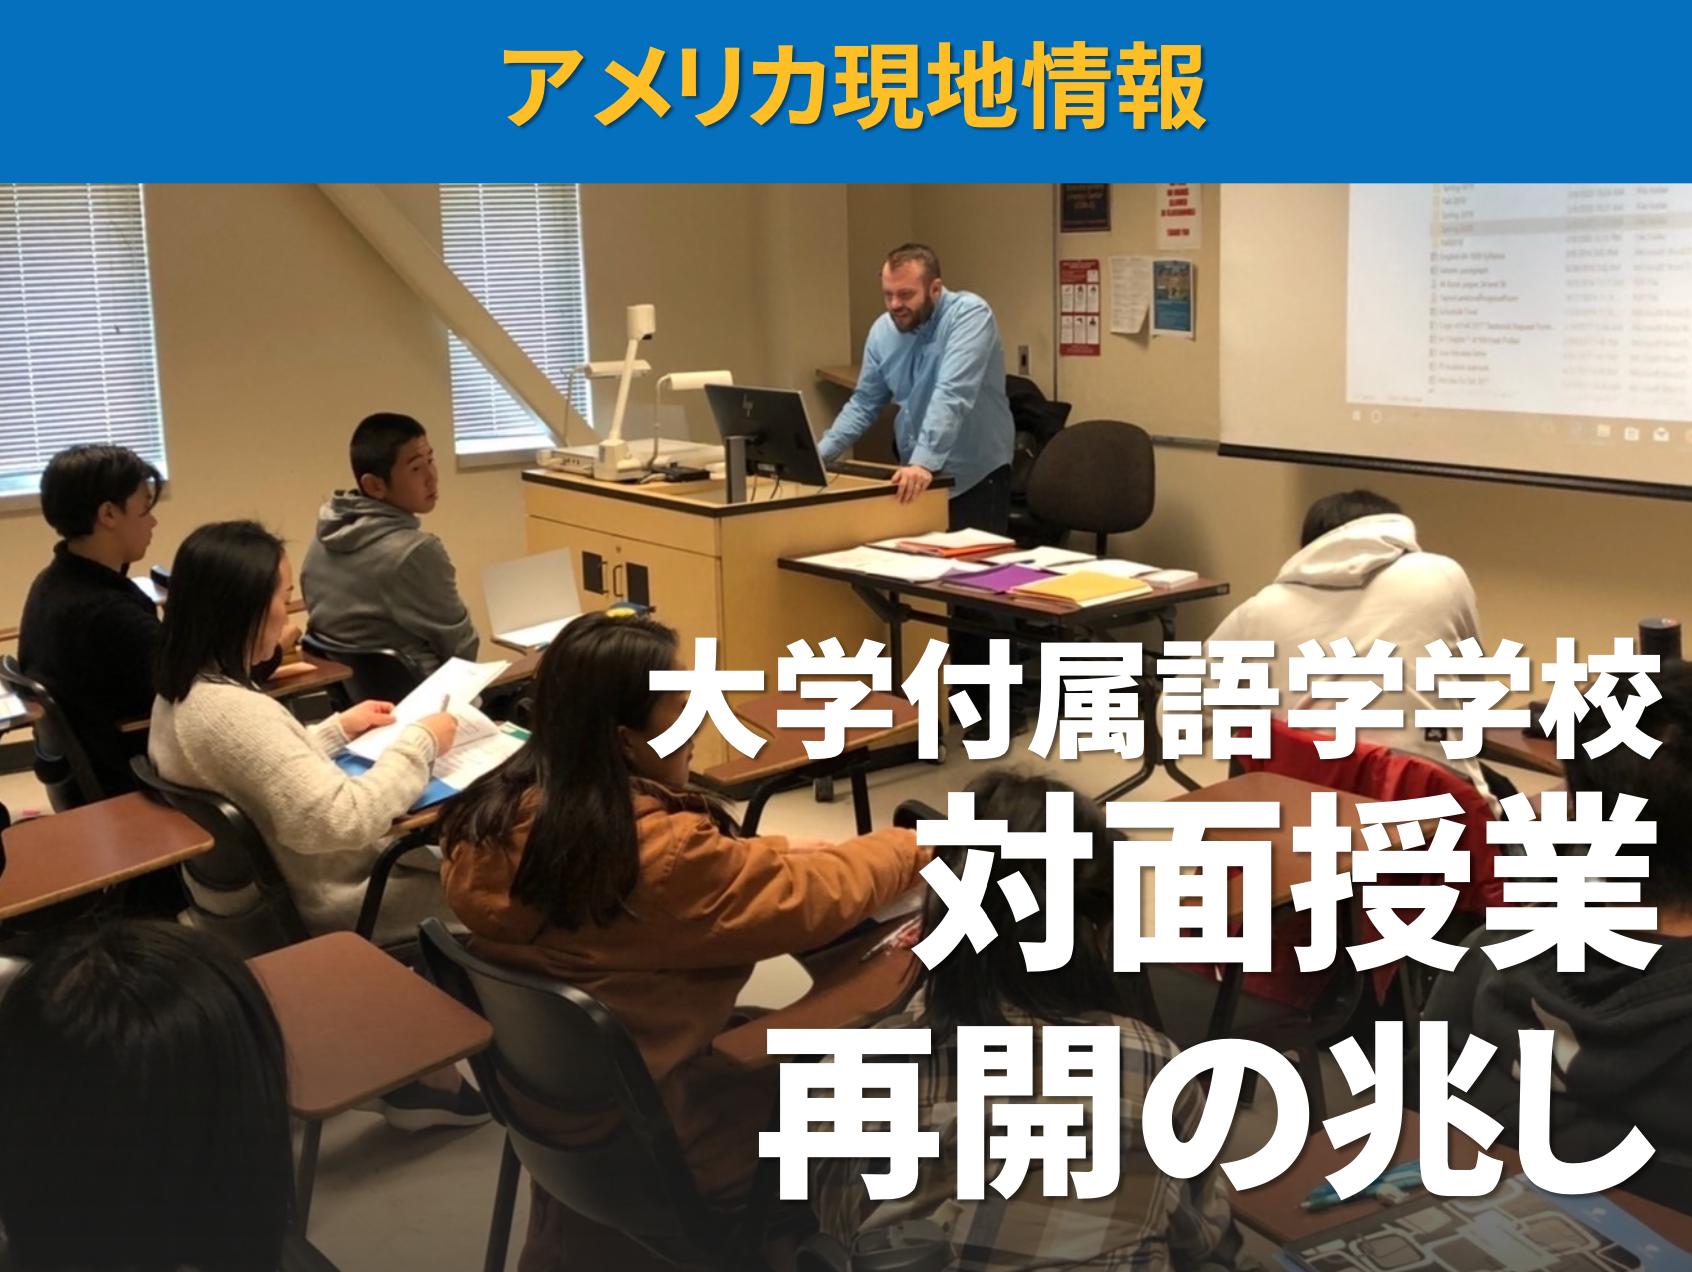 【MCELI】マーセッドカレッジ付属語学学校再開